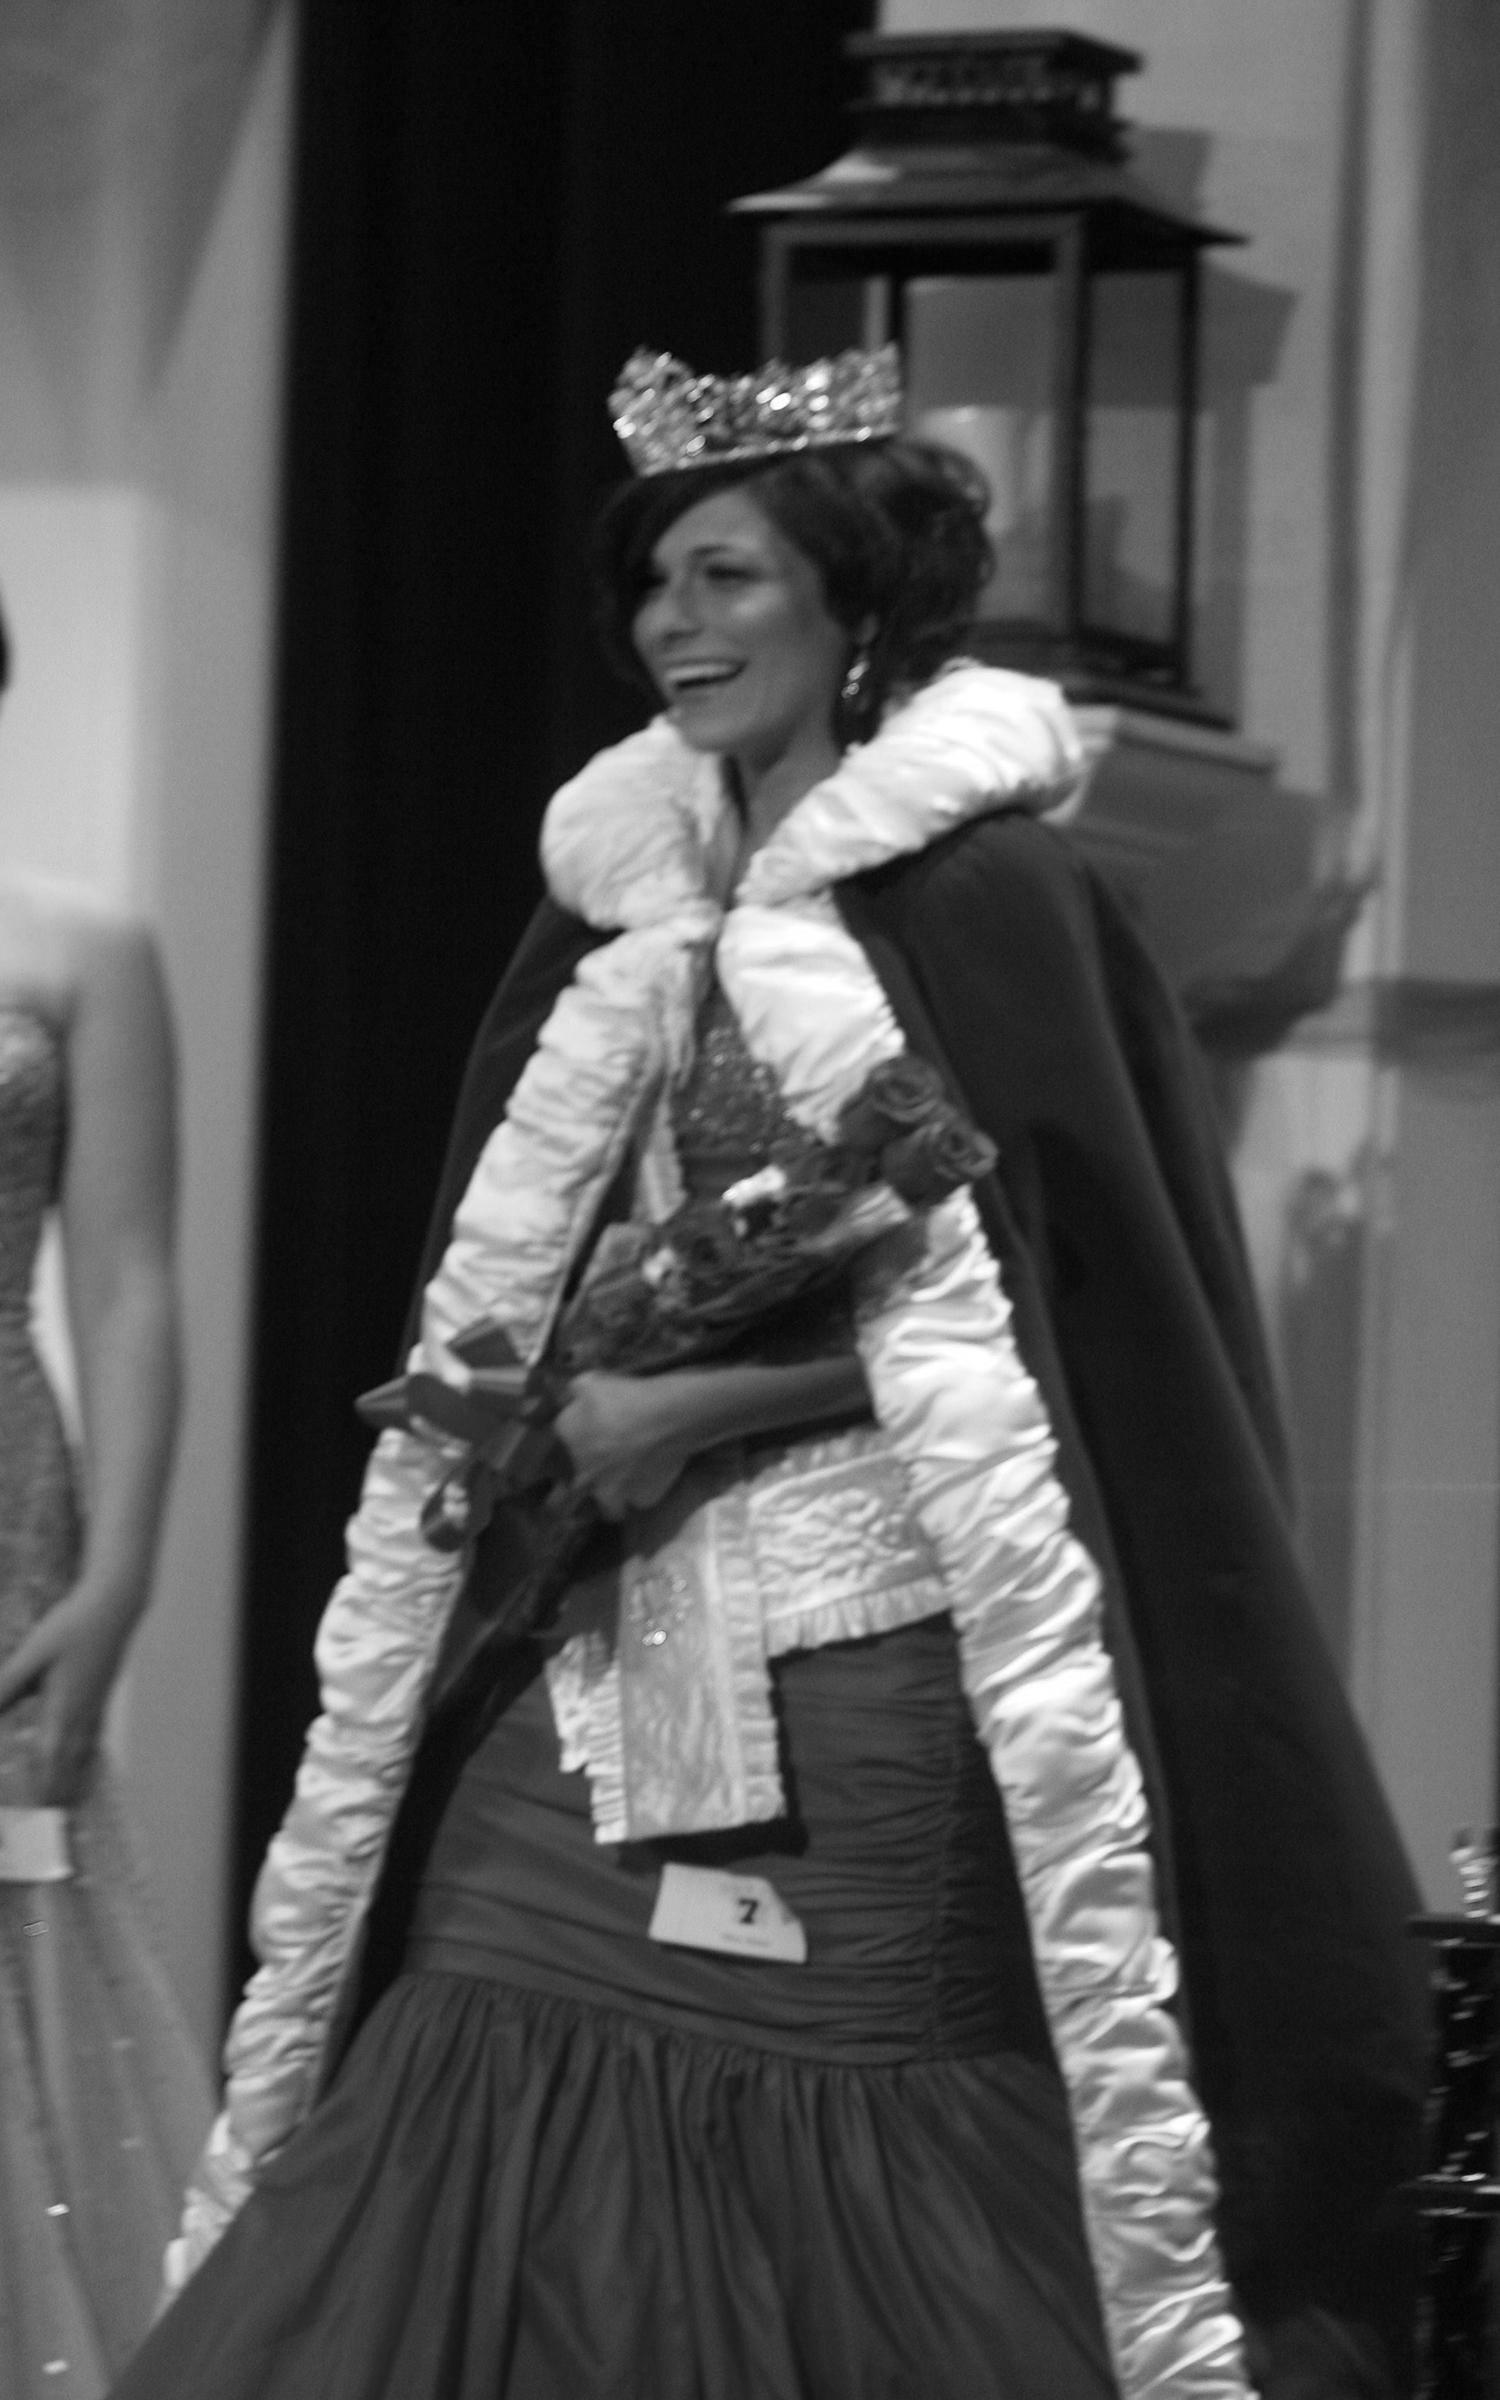 Jessica Schneider Vanover - Miss Buna 2008